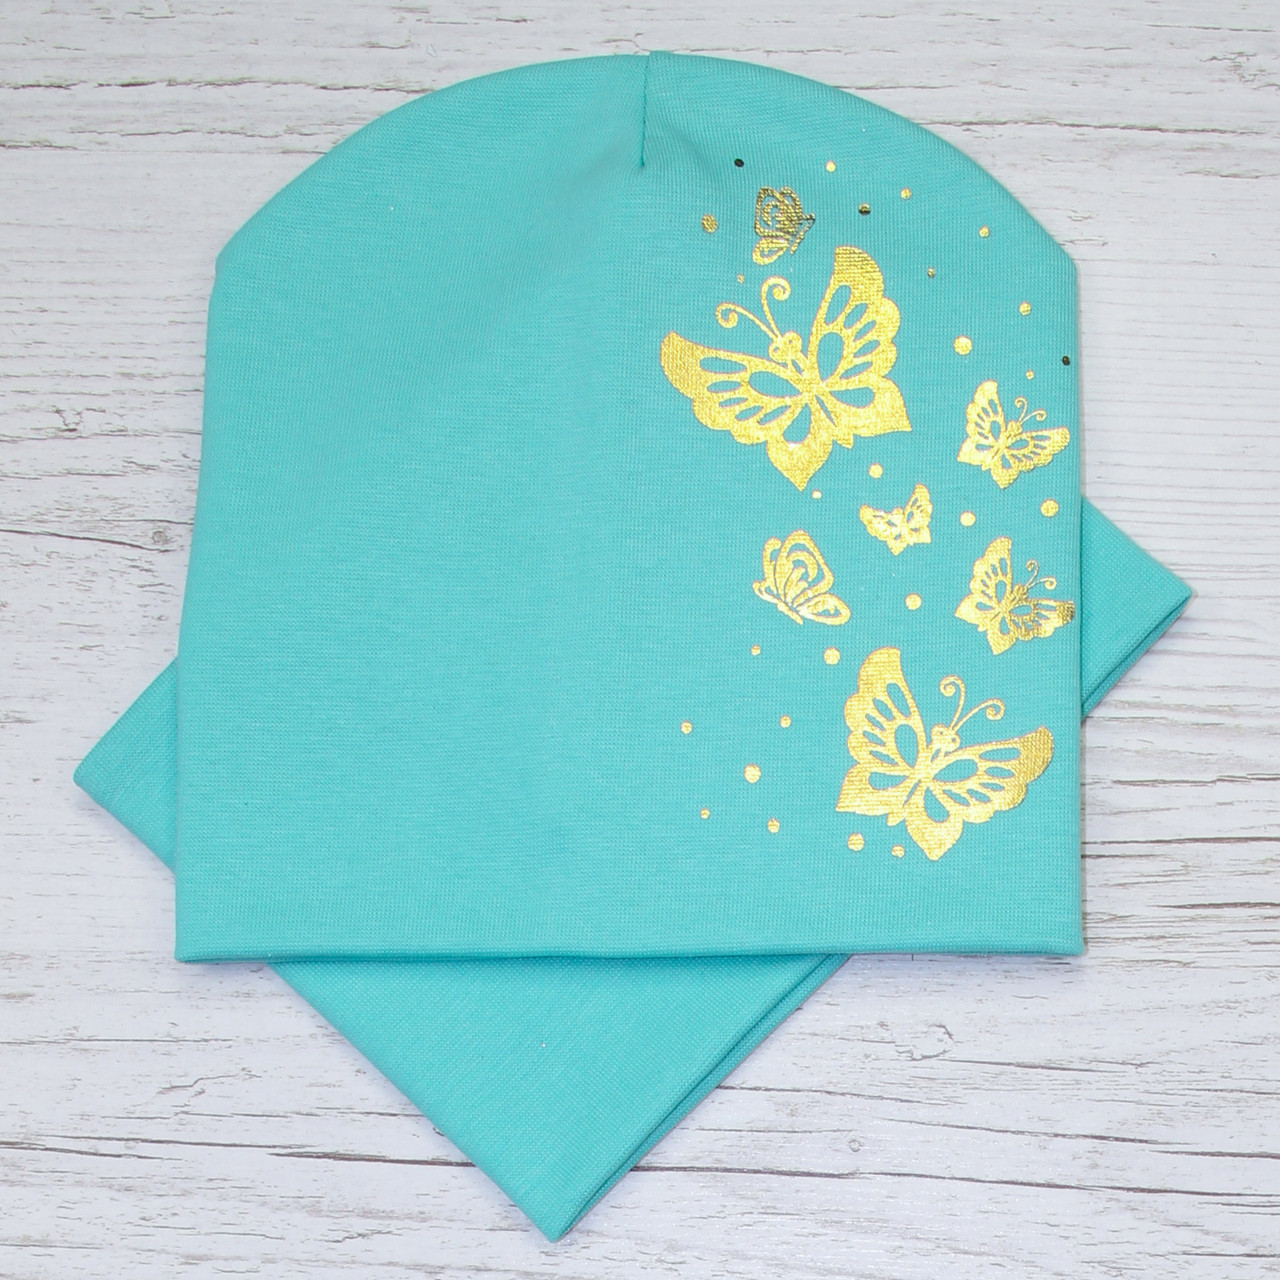 Трикотажная бабочки золото Комплект шапка + баф мята 48-52р.